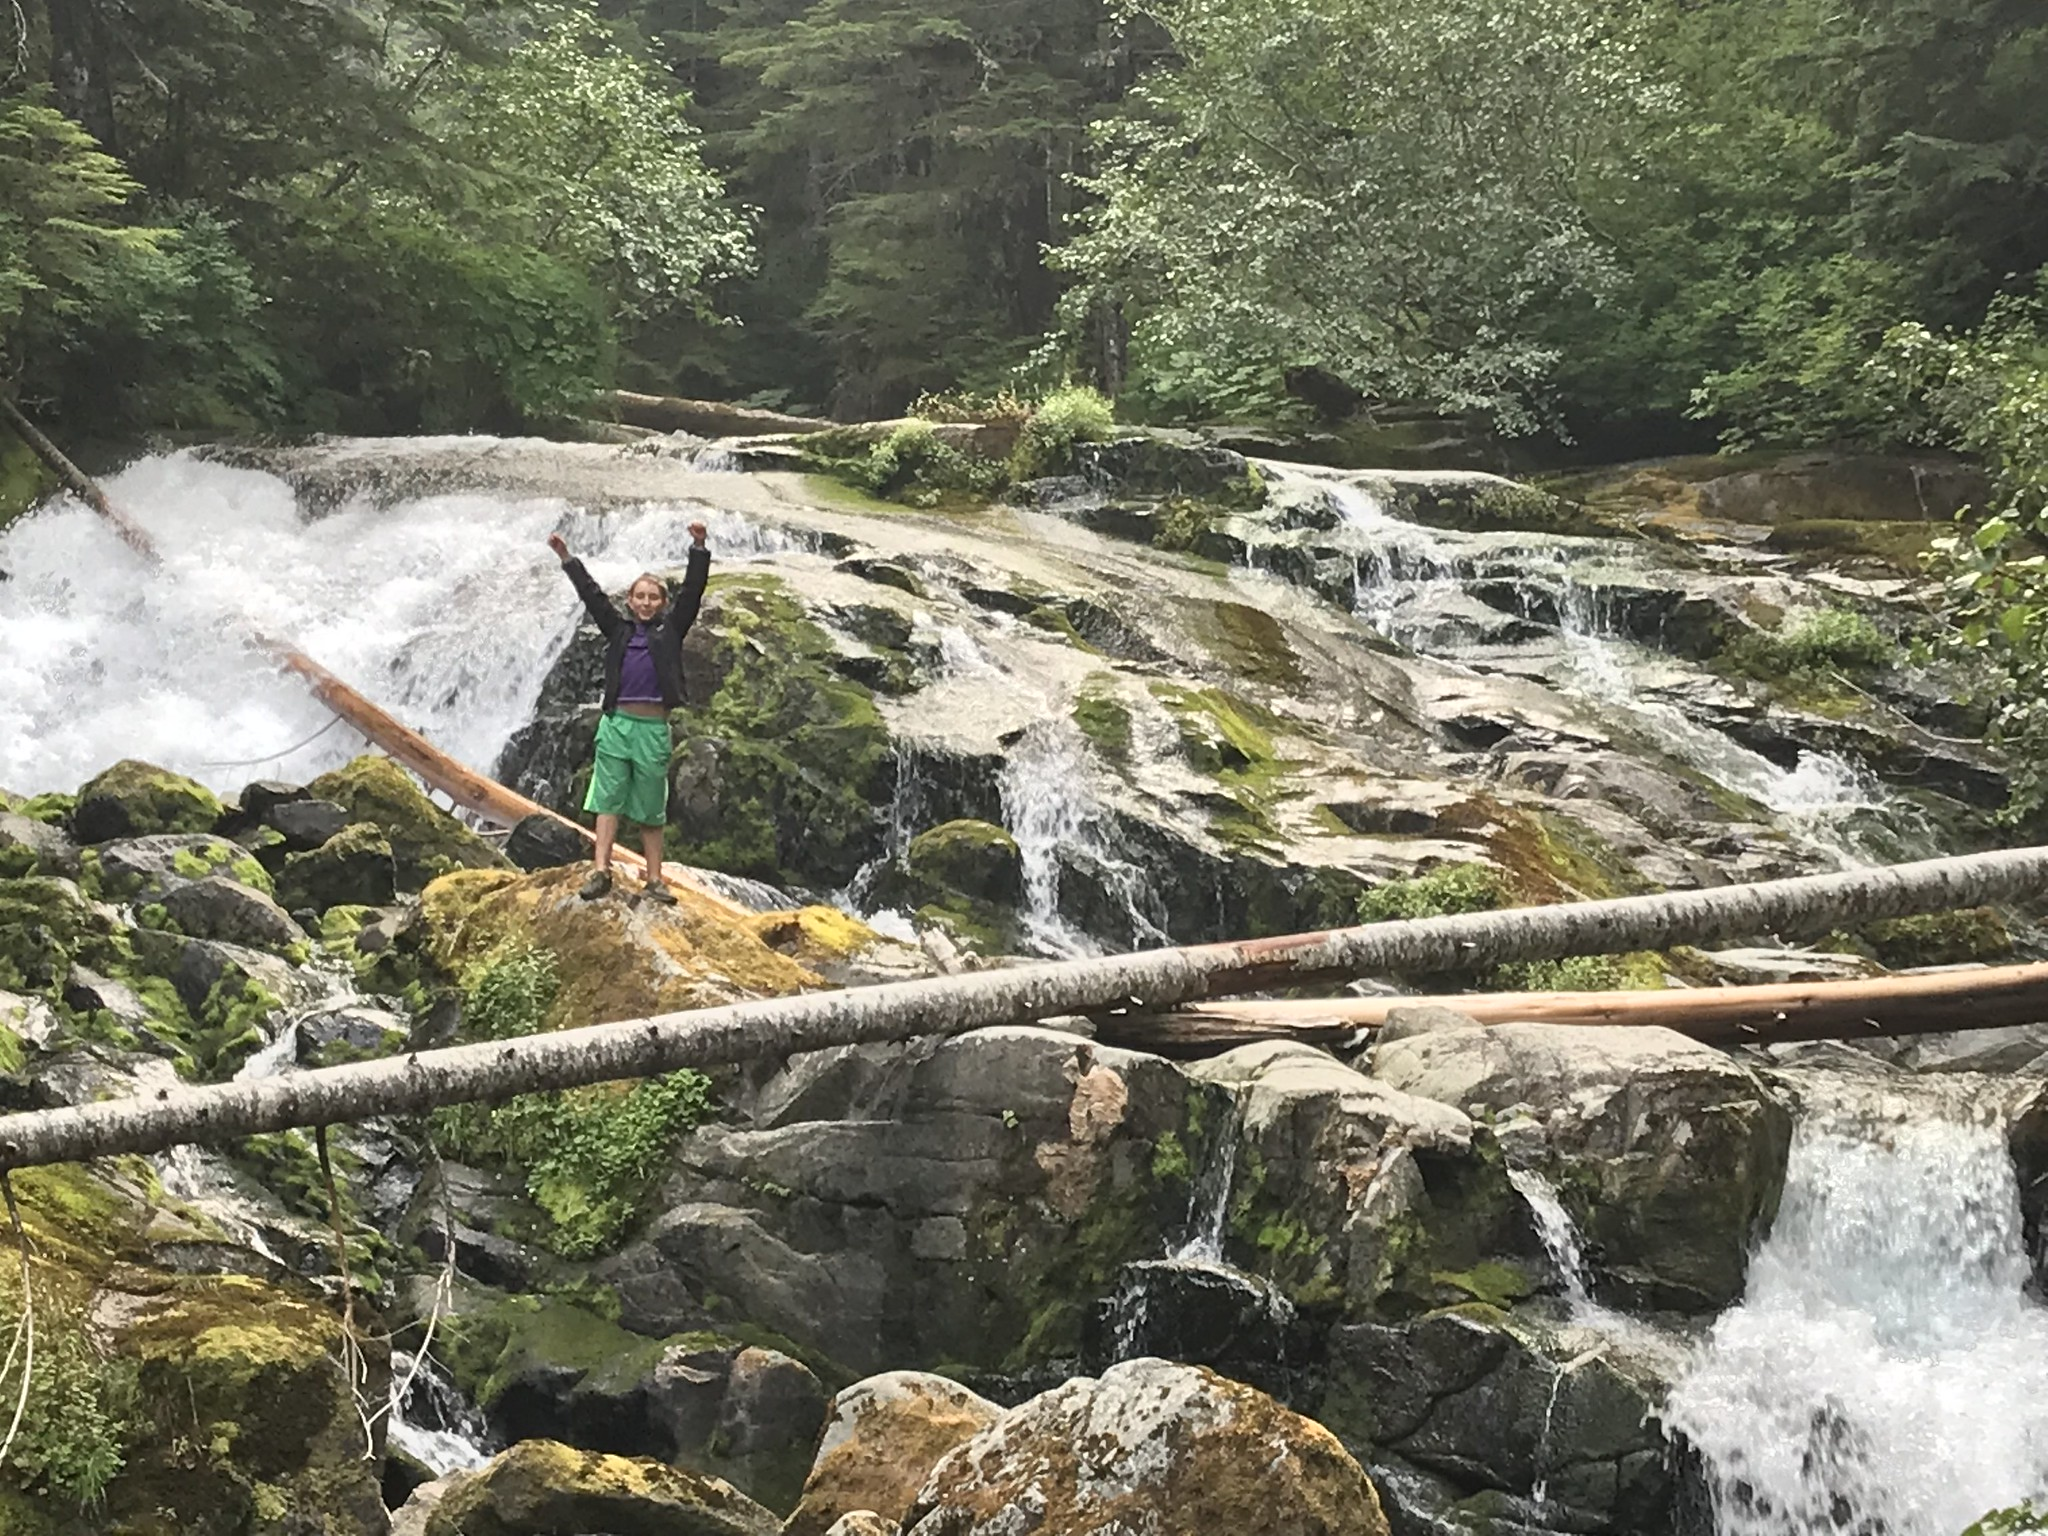 Casper triumphant on a river island